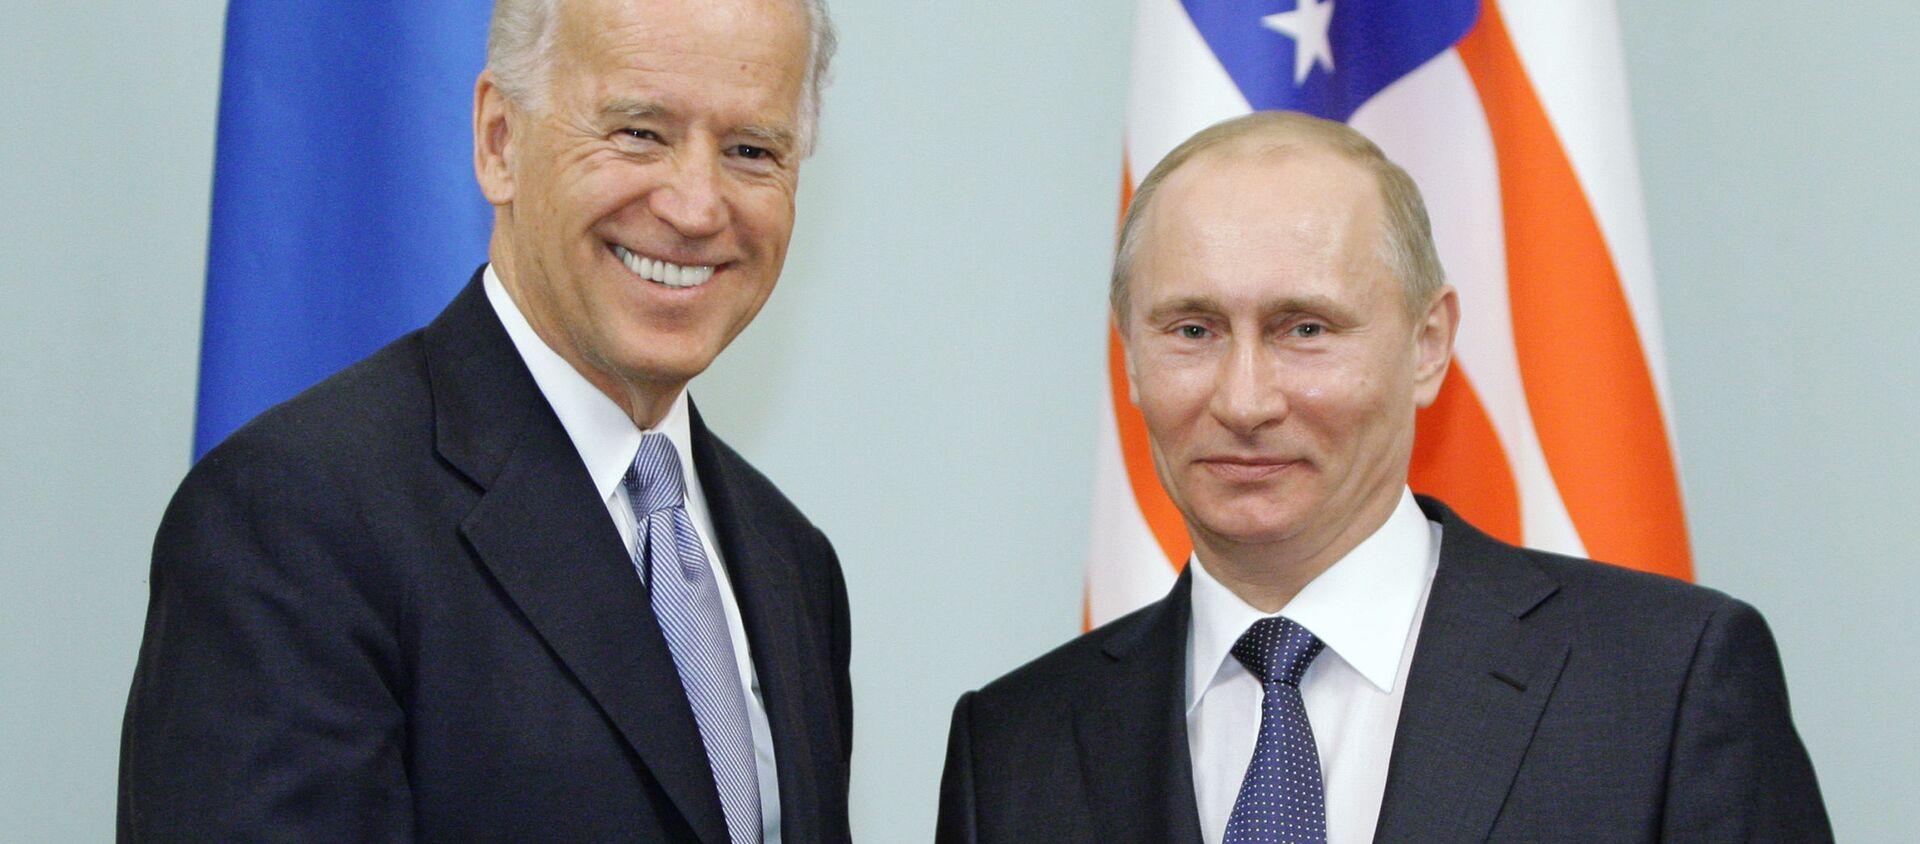 Joe Biden i Władimir Putin - Sputnik Polska, 1920, 15.04.2021